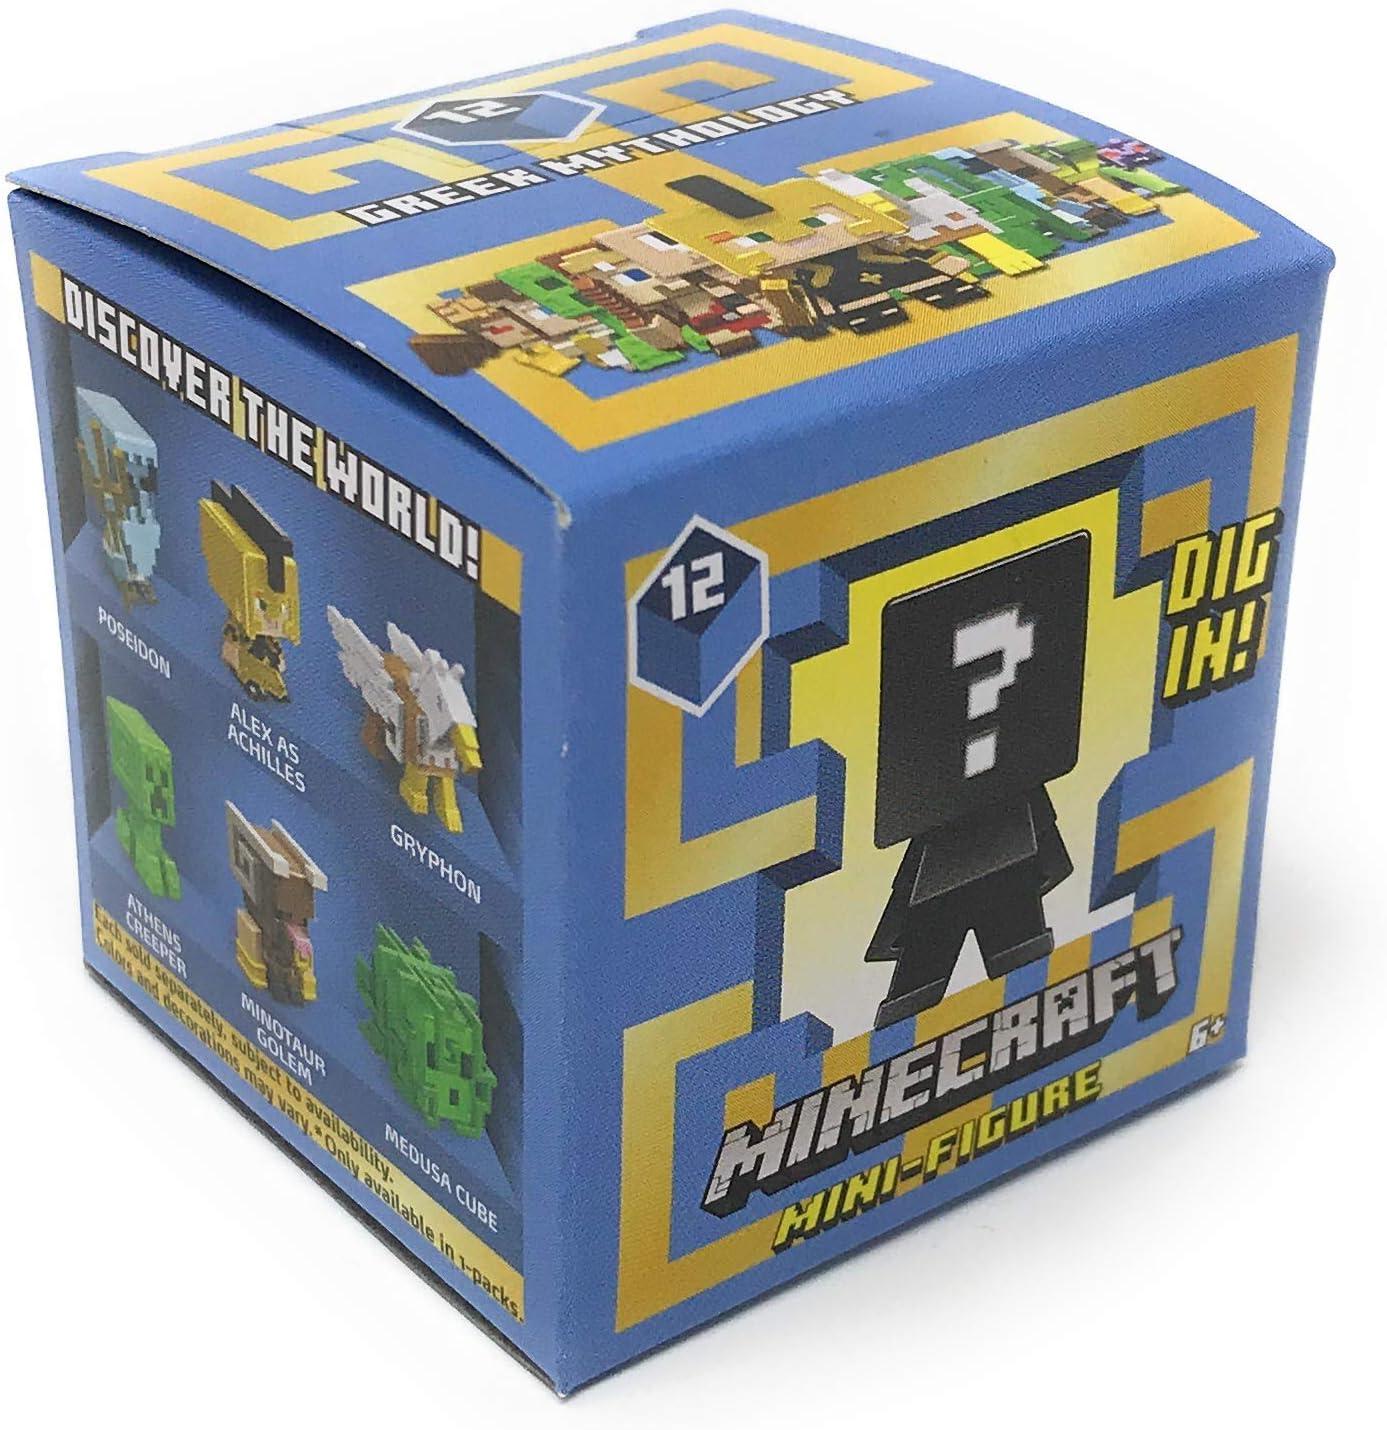 Minecraft Series 12 Greek Mythology Mini Figure Set with Exclusive Hydra Harpy